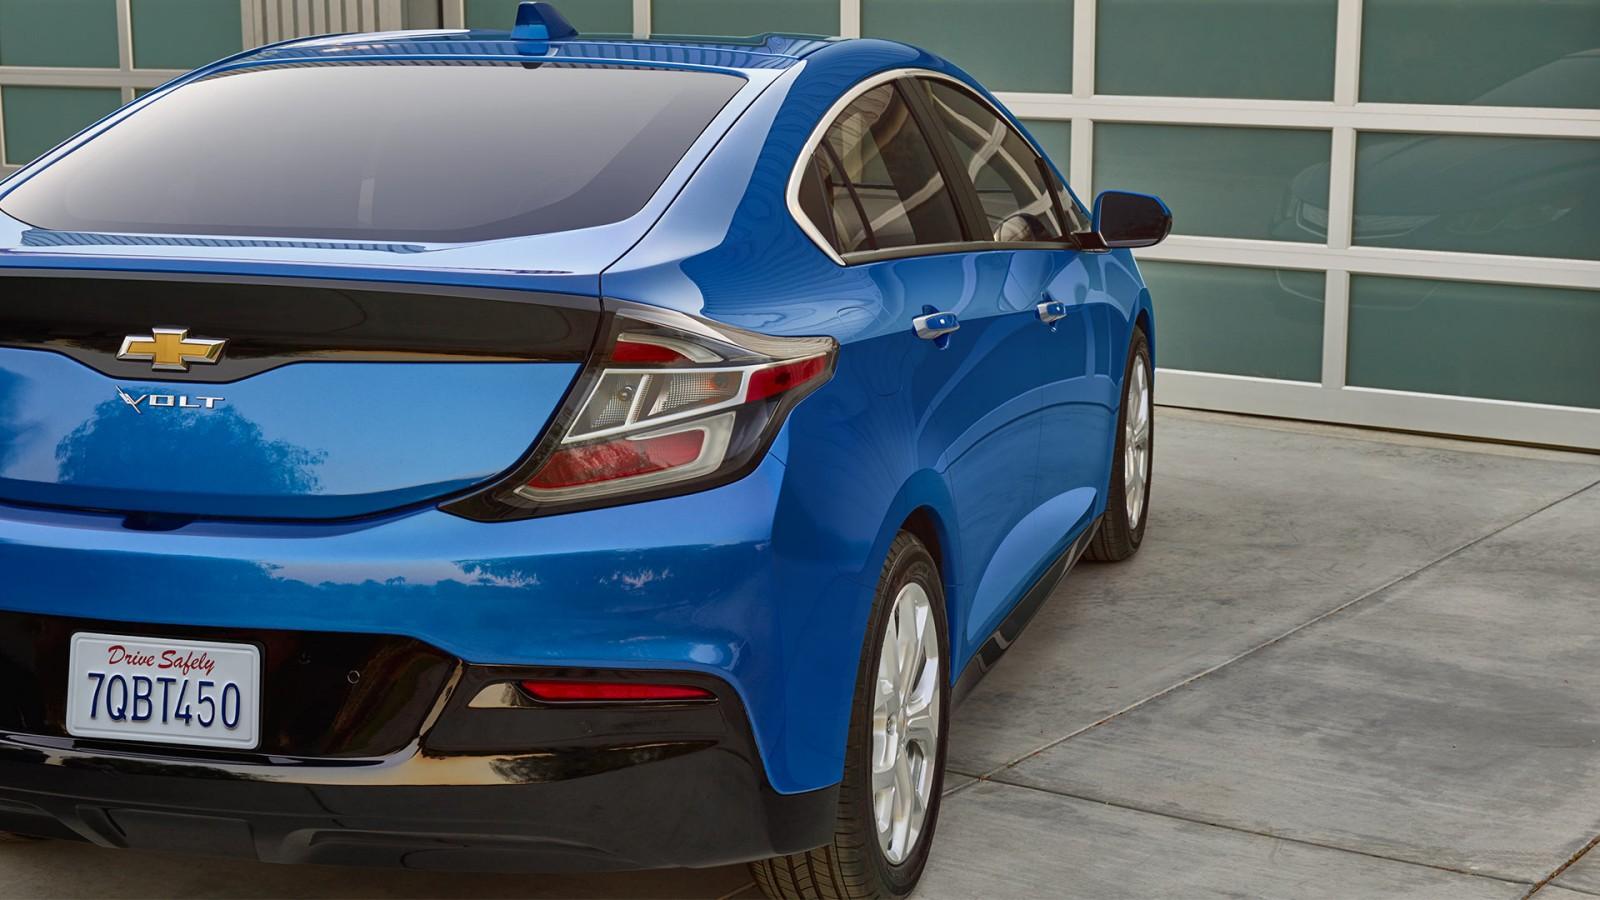 Chevrolet Volt Lease Deals Price Jeff Wyler Louisville KY - Chevrolet louisville ky